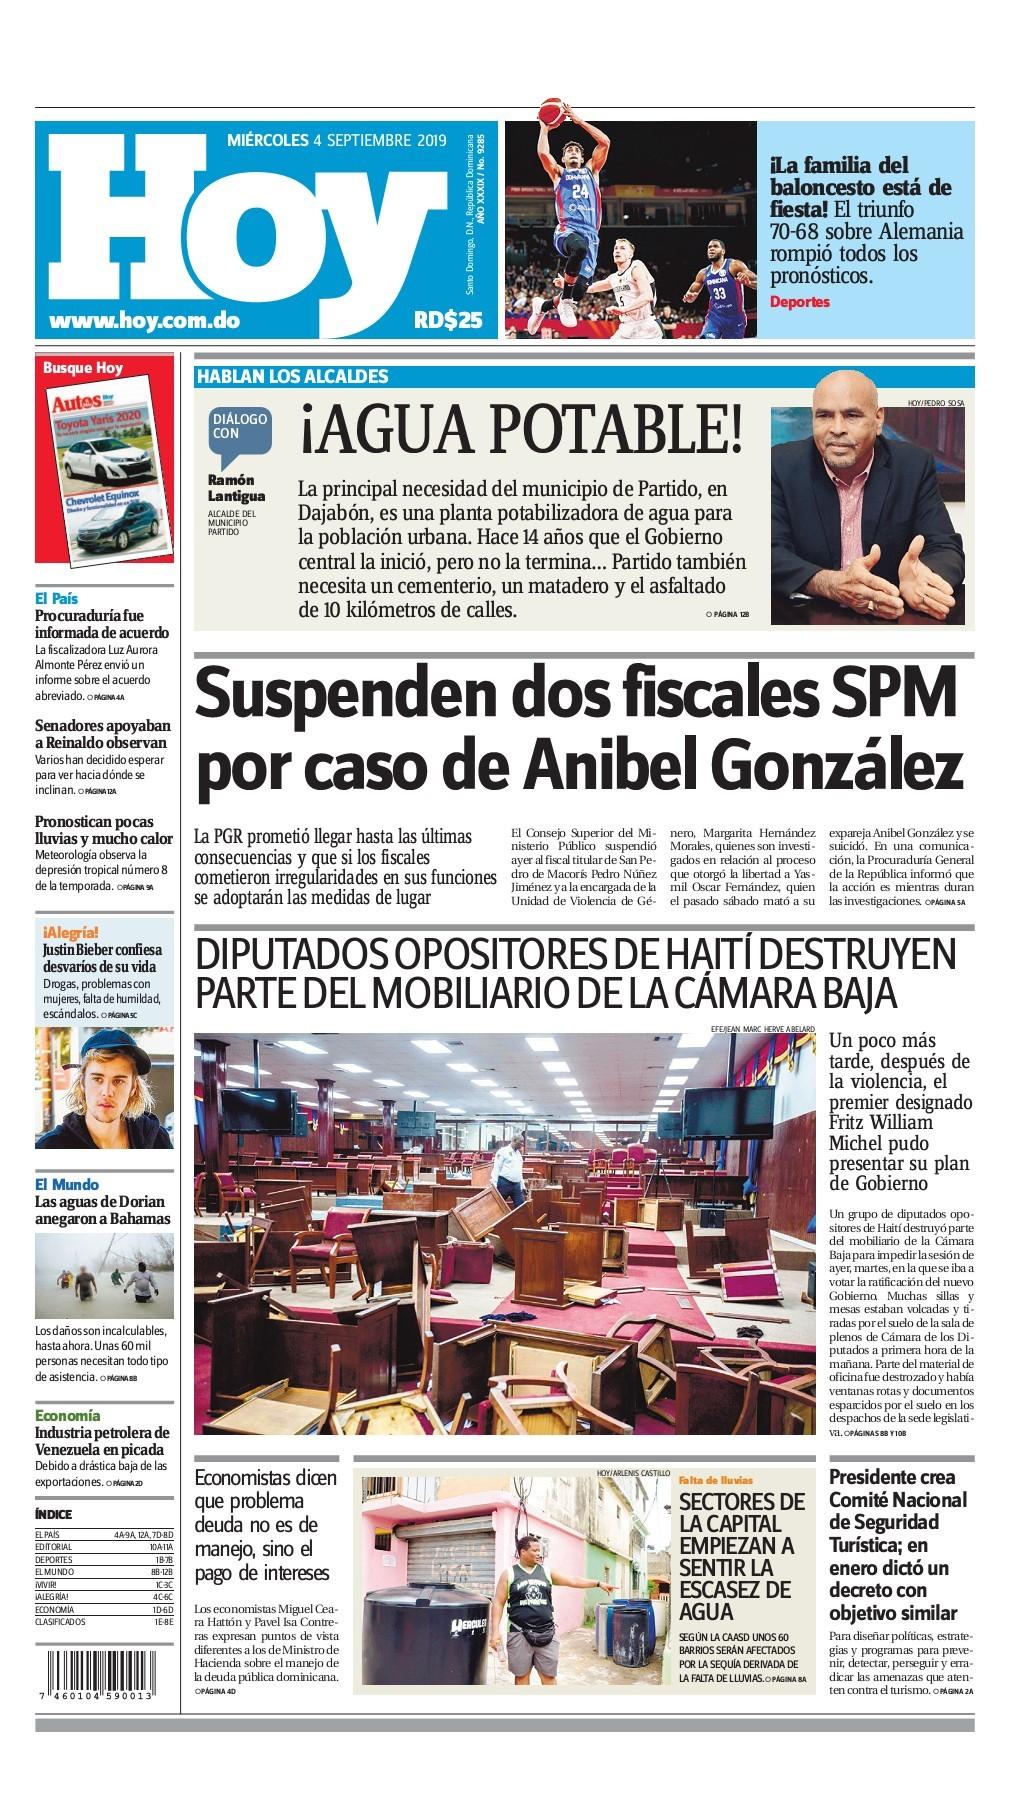 Portada Periódico Hoy, Miércoles 04 de Septiembre, 2019